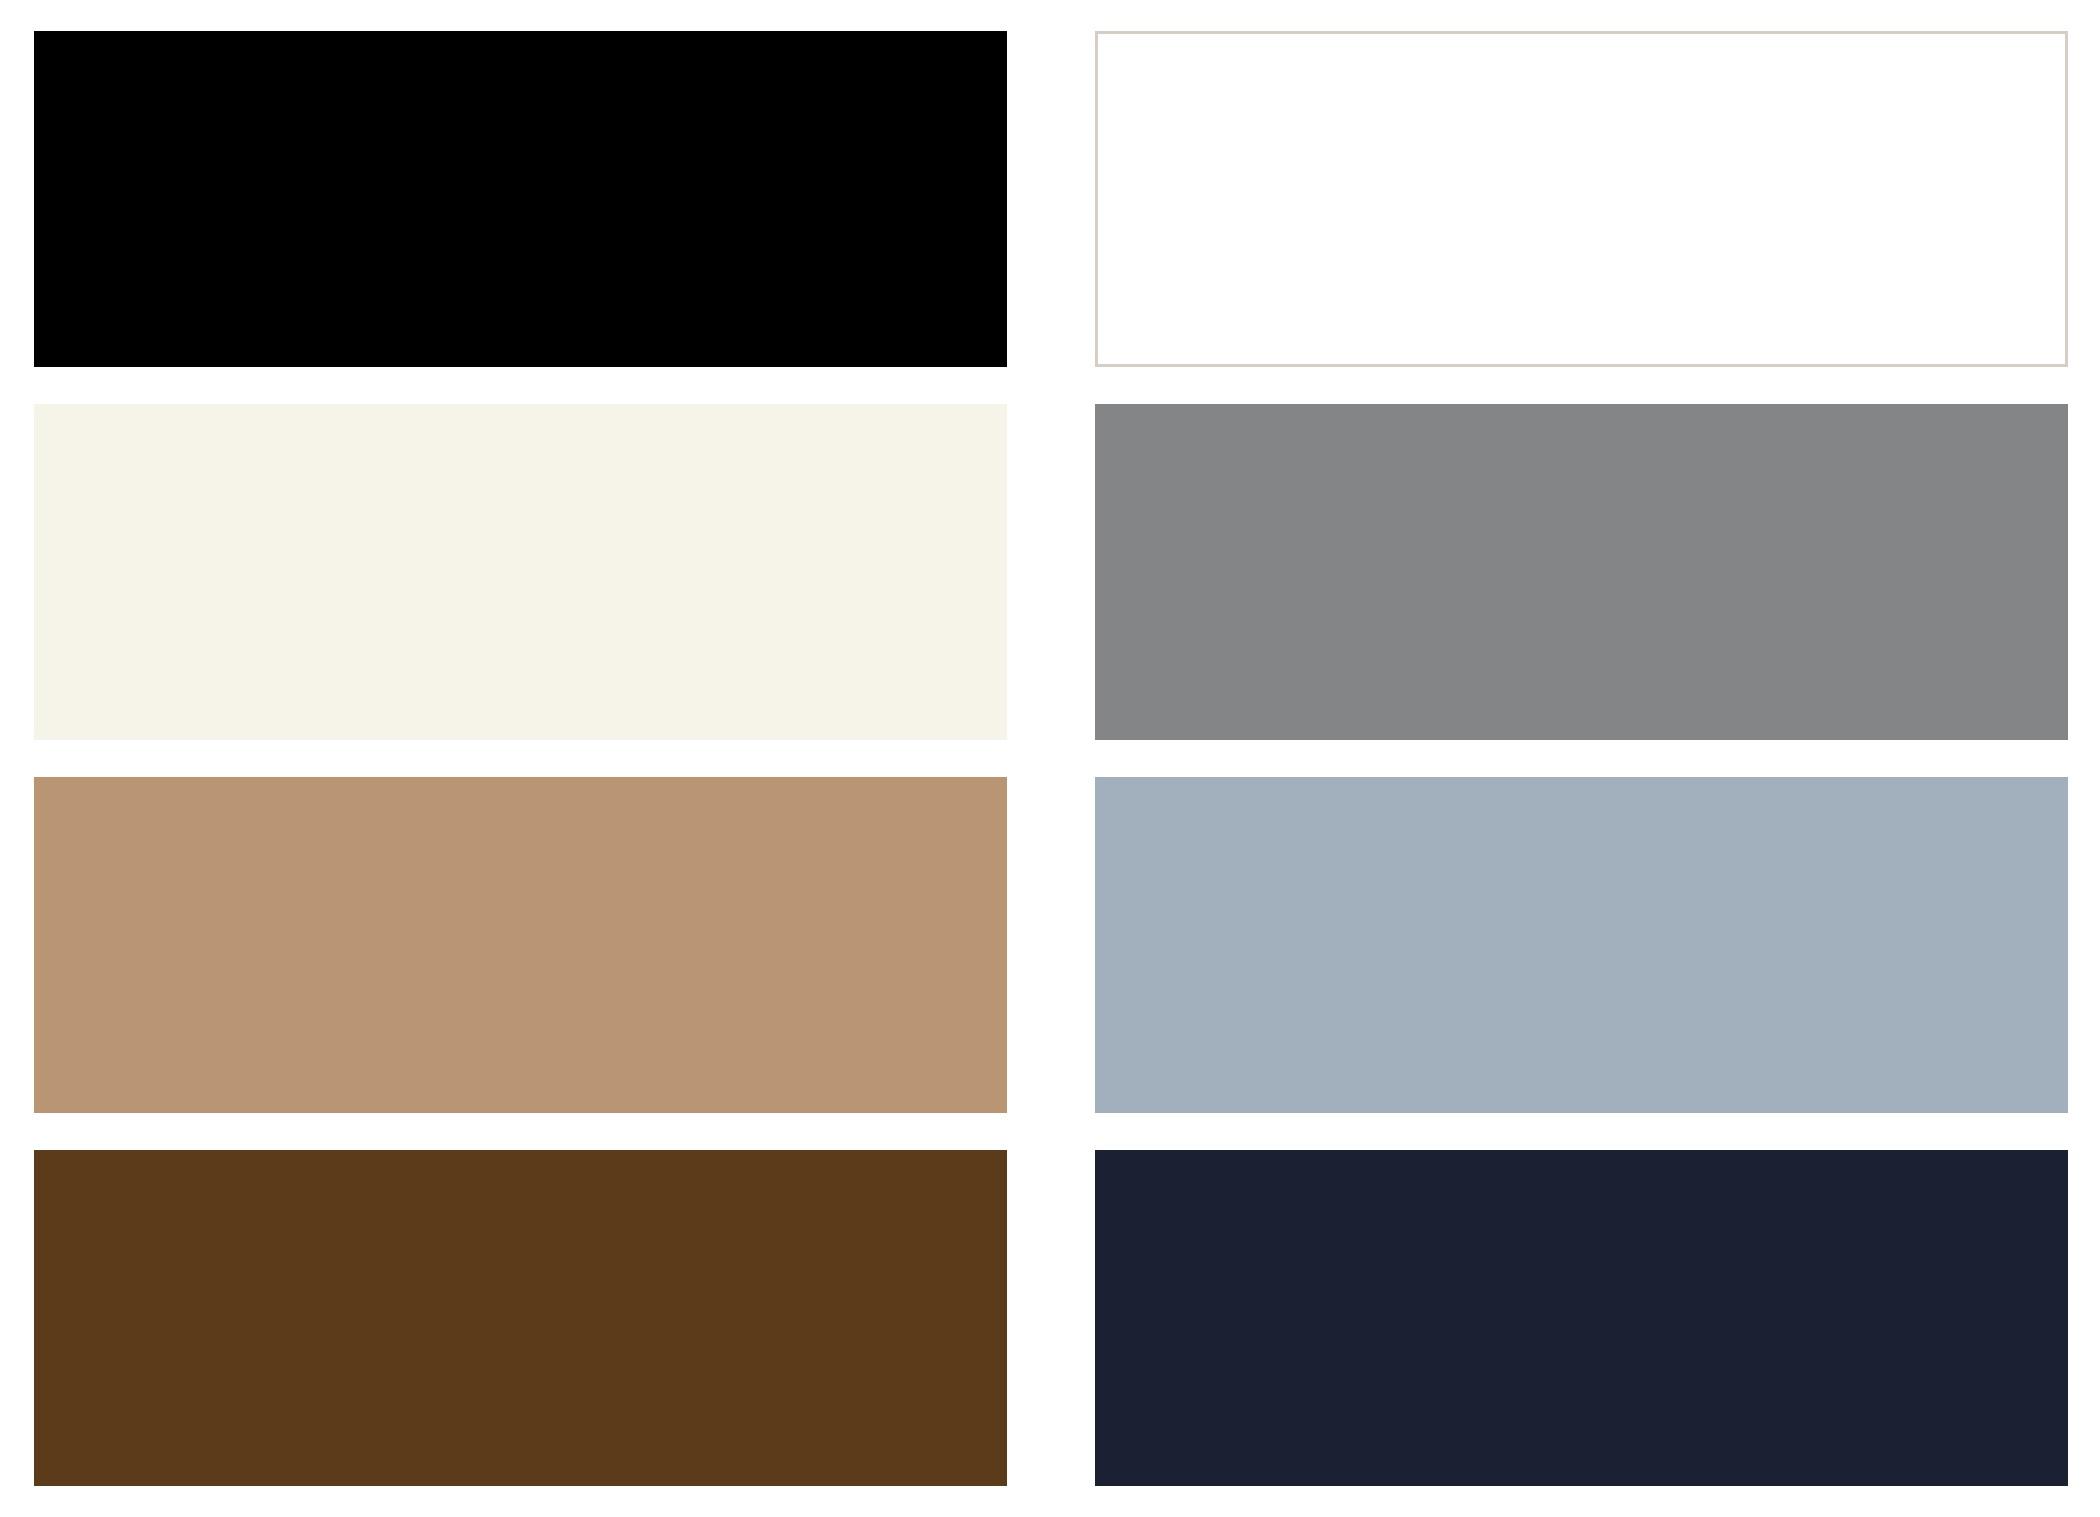 capsule-wardrobe-color-palette.jpg